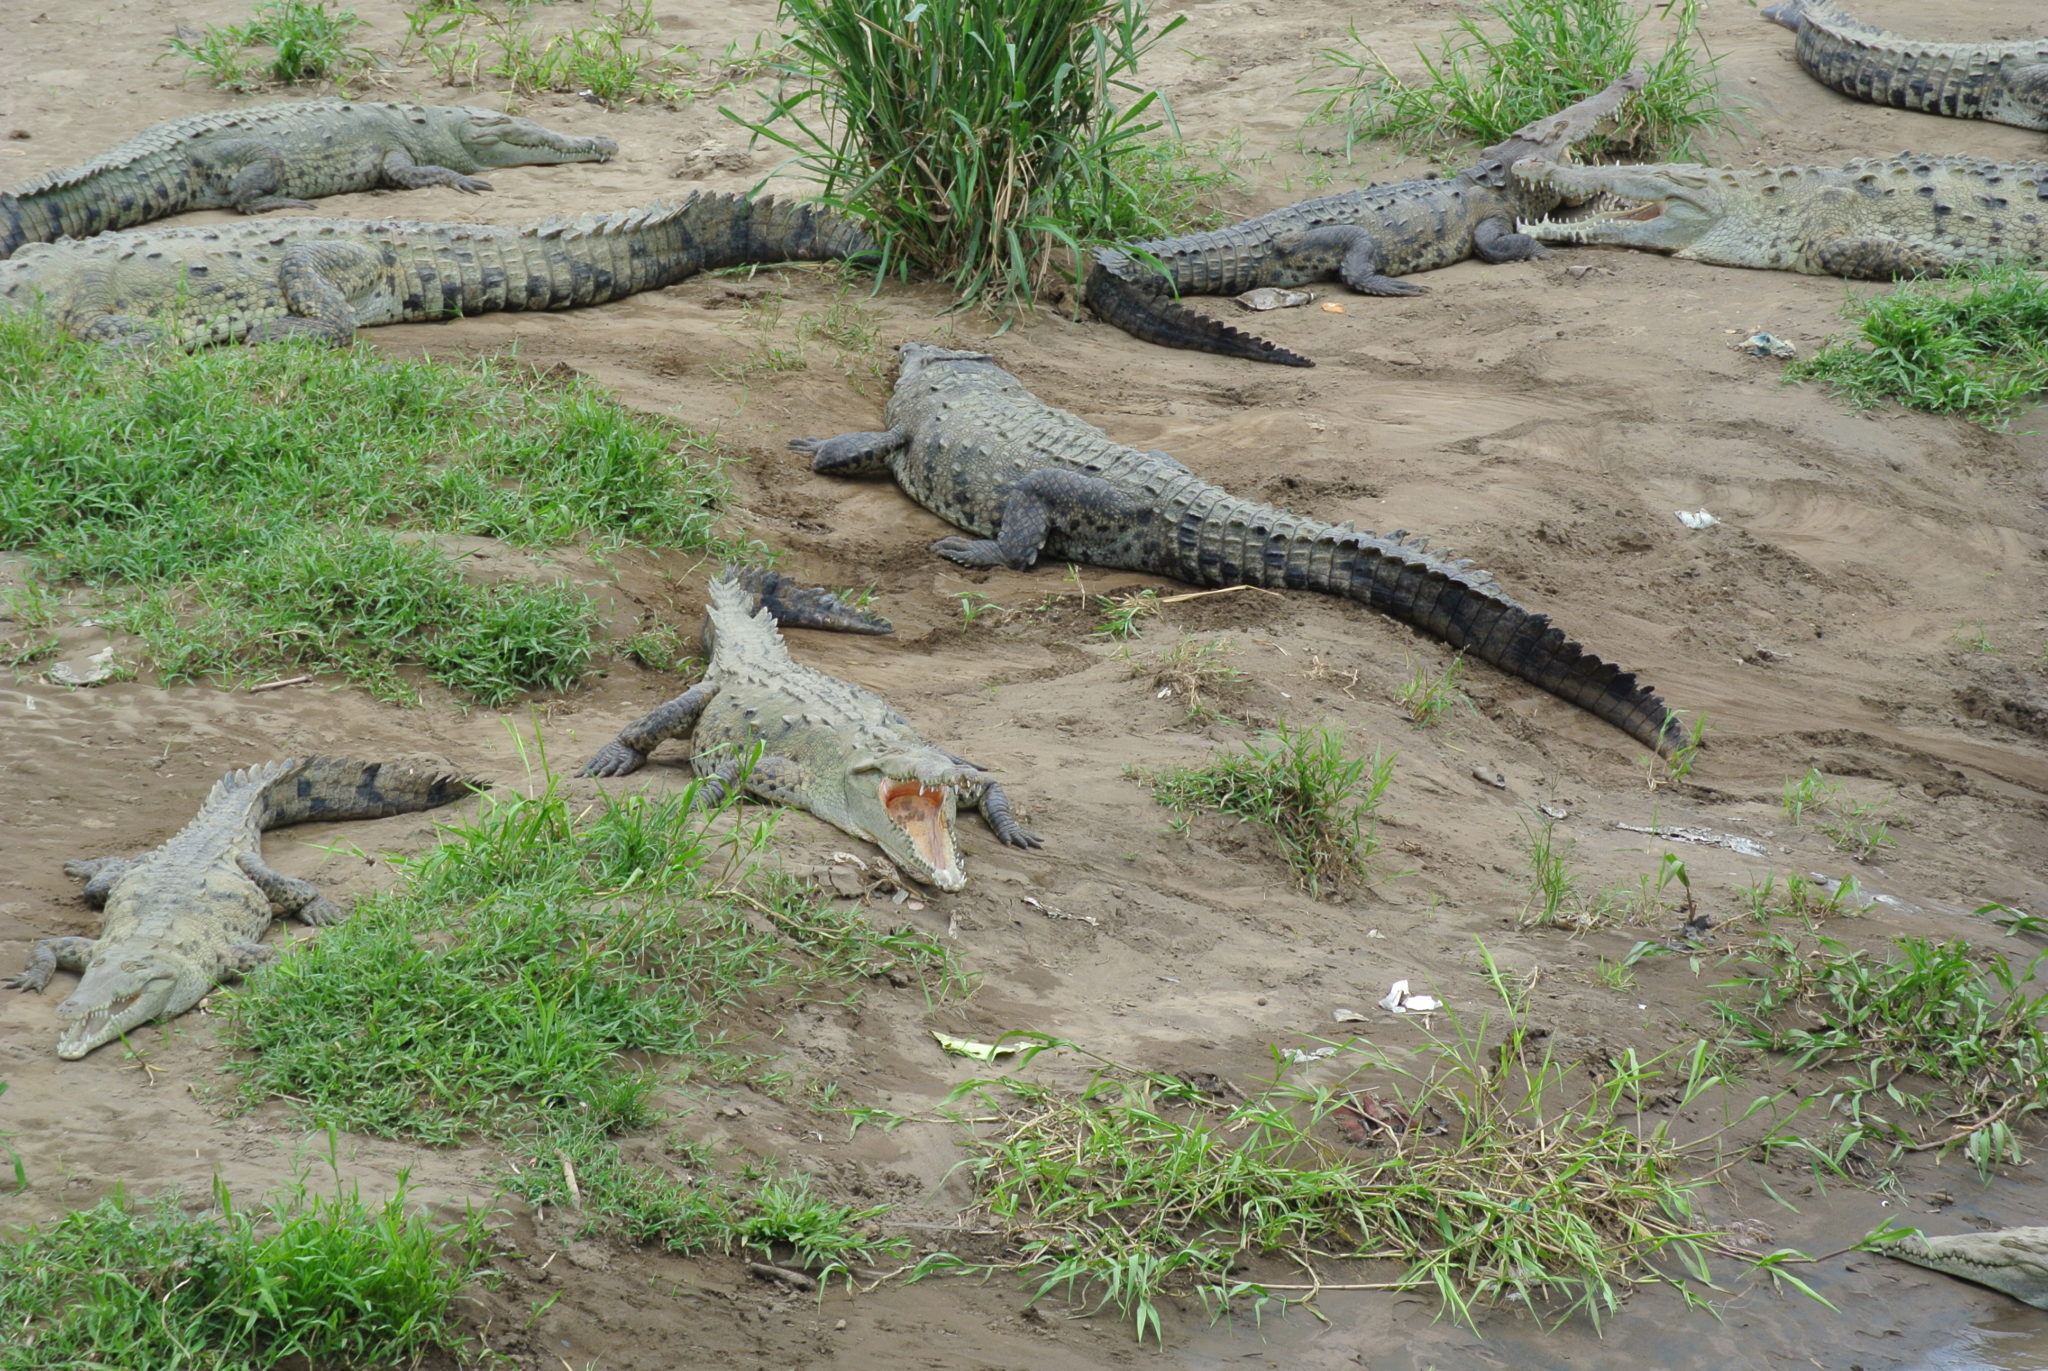 krokodillen Costa Rica